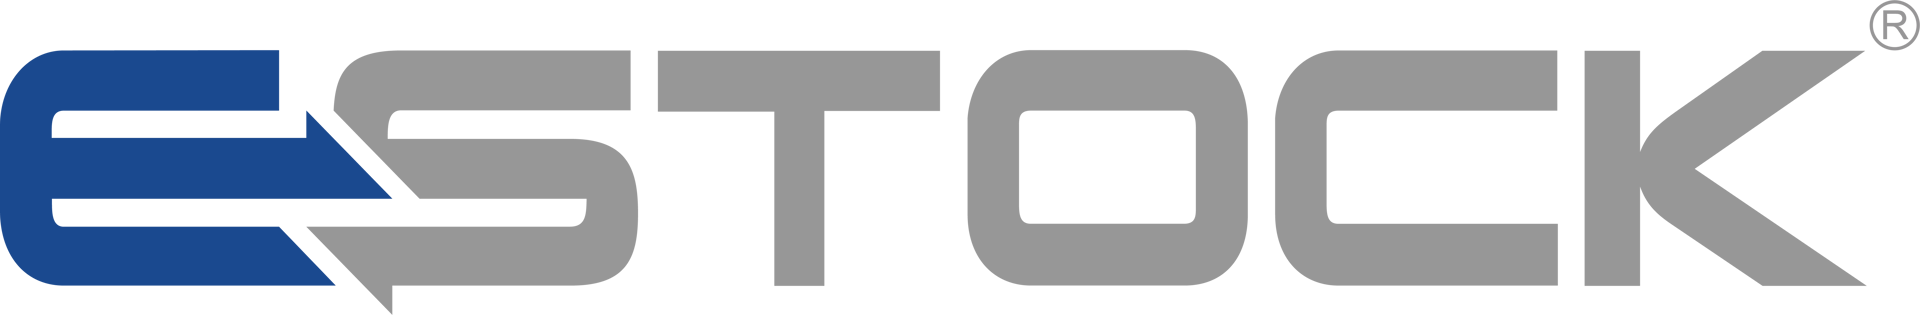 Estock company logo